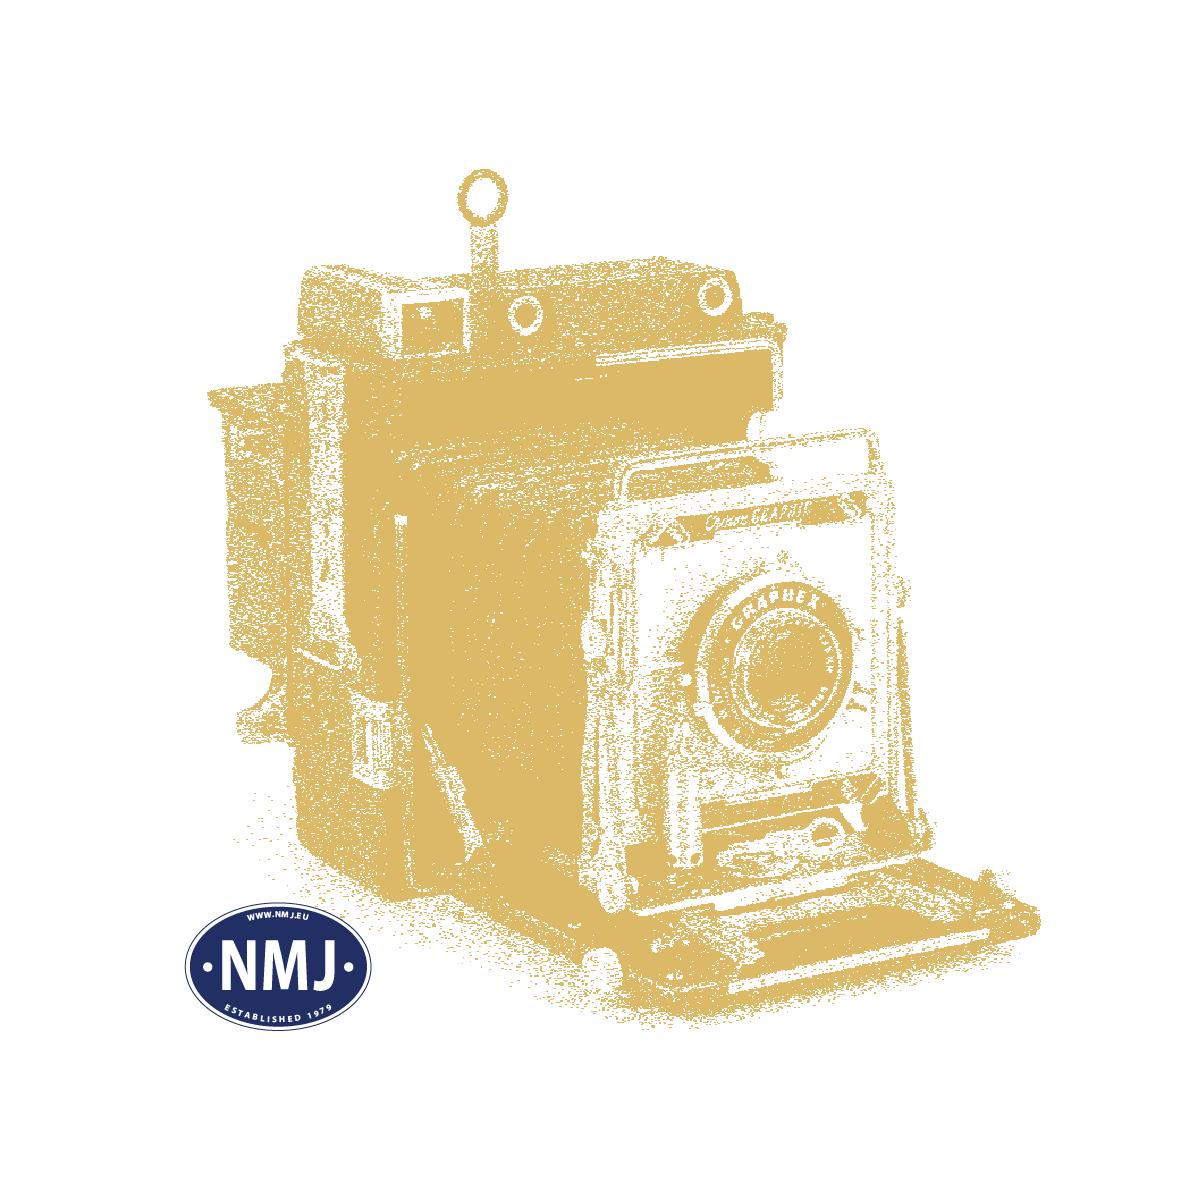 NMJT81.401AC - NMJ Topline NSB BM73, rot/silber/grau/orange, AC